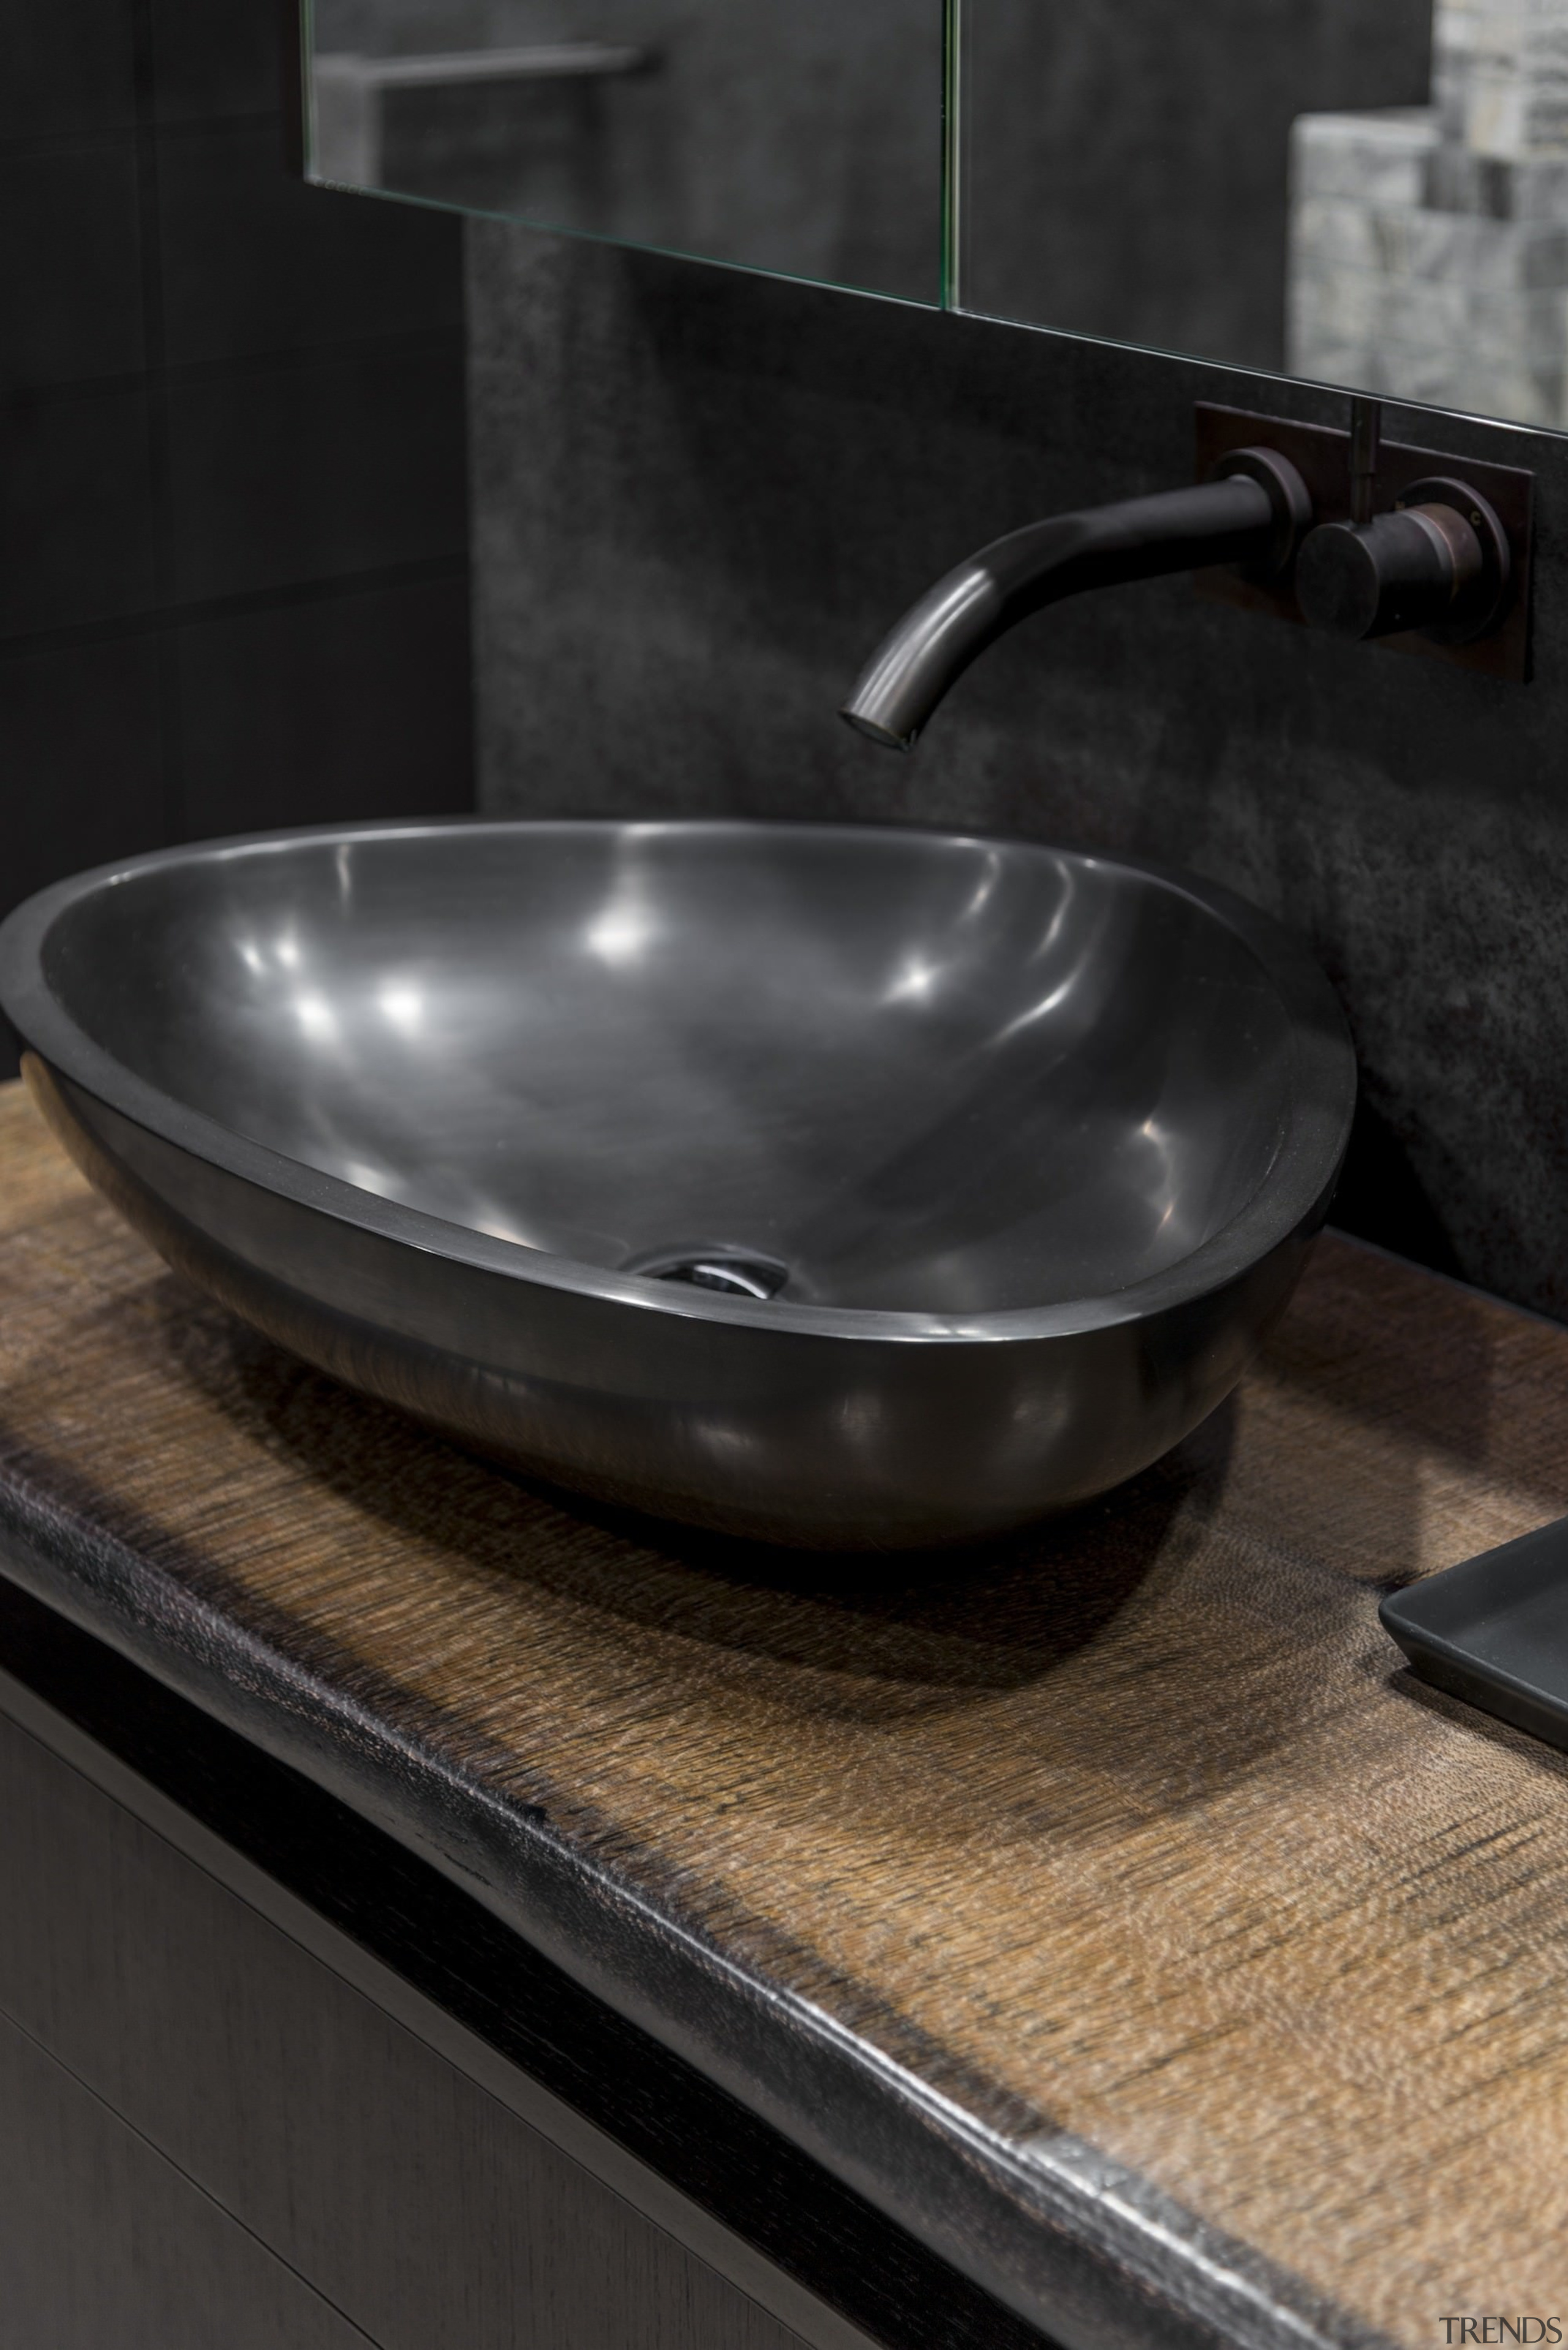 Sublime Architectural Interiors - TIDA AUS 2017 – bathroom sink, ceramic, cookware and bakeware, plumbing fixture, sink, black